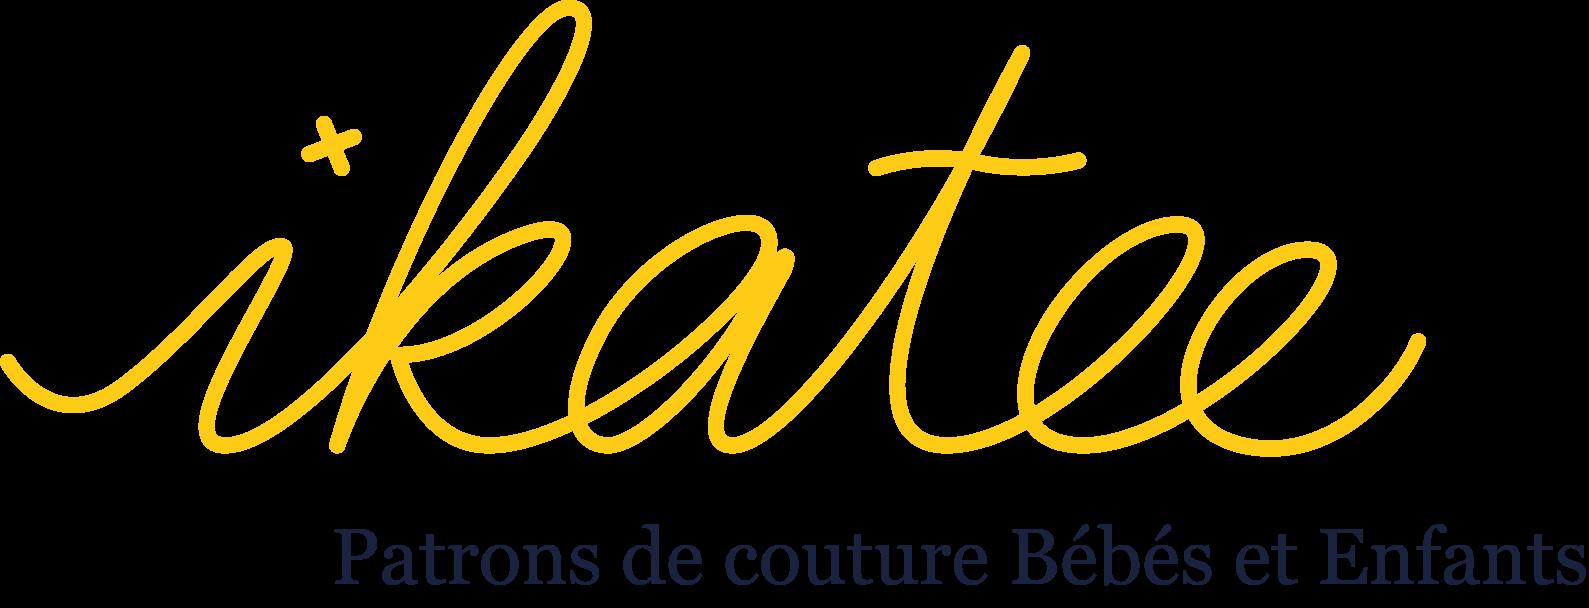 logo Ikatee